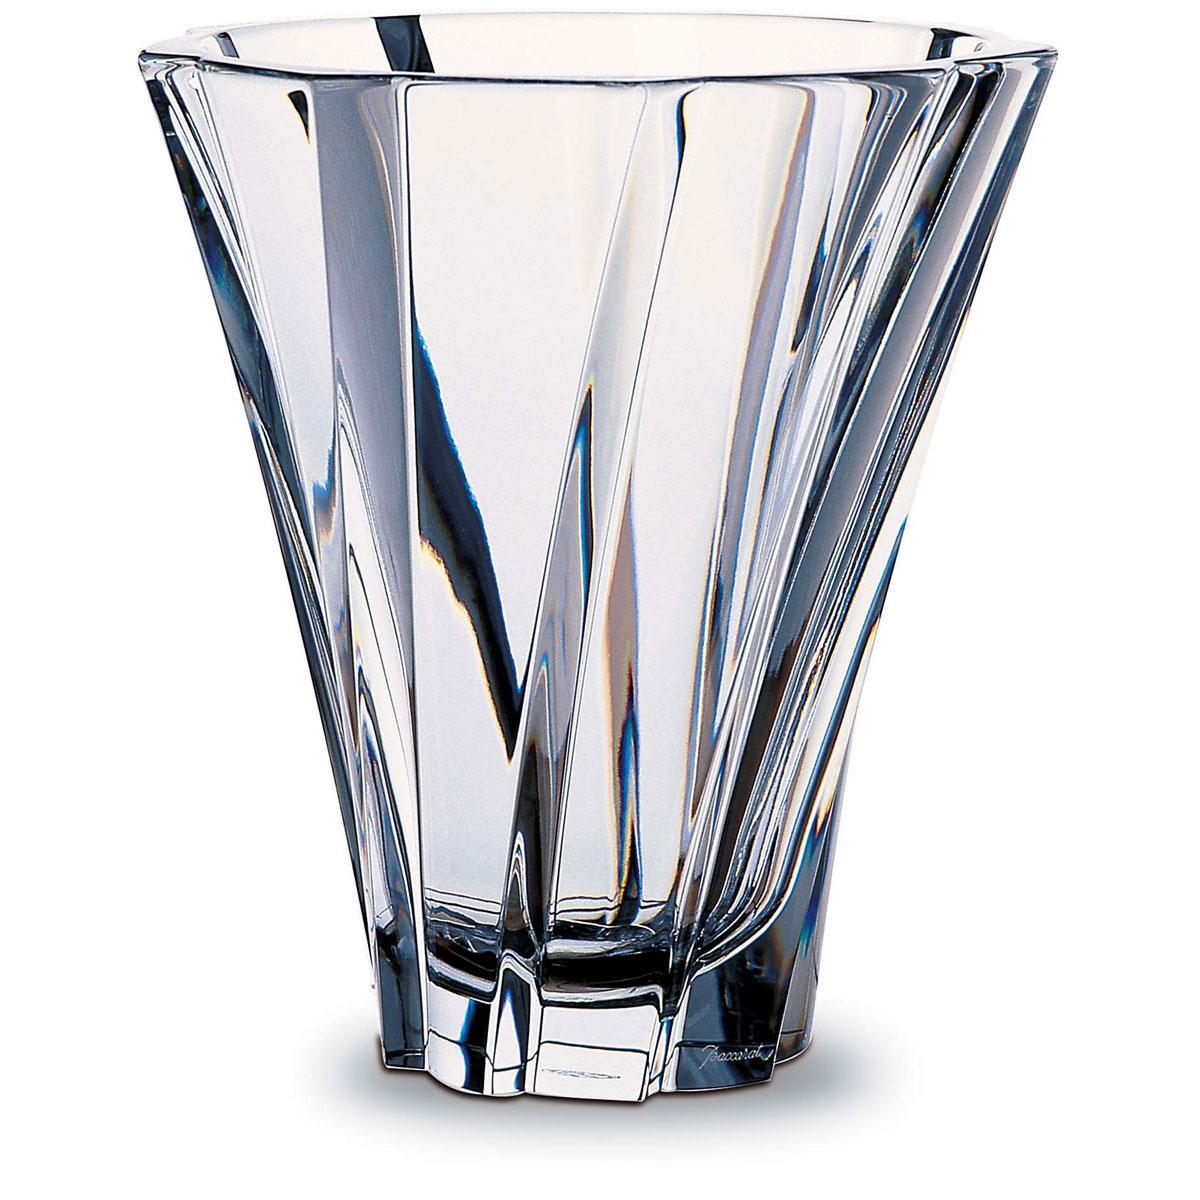 "Baccarat Crystal, Objectif 8 1/4"" Crystal Vase"